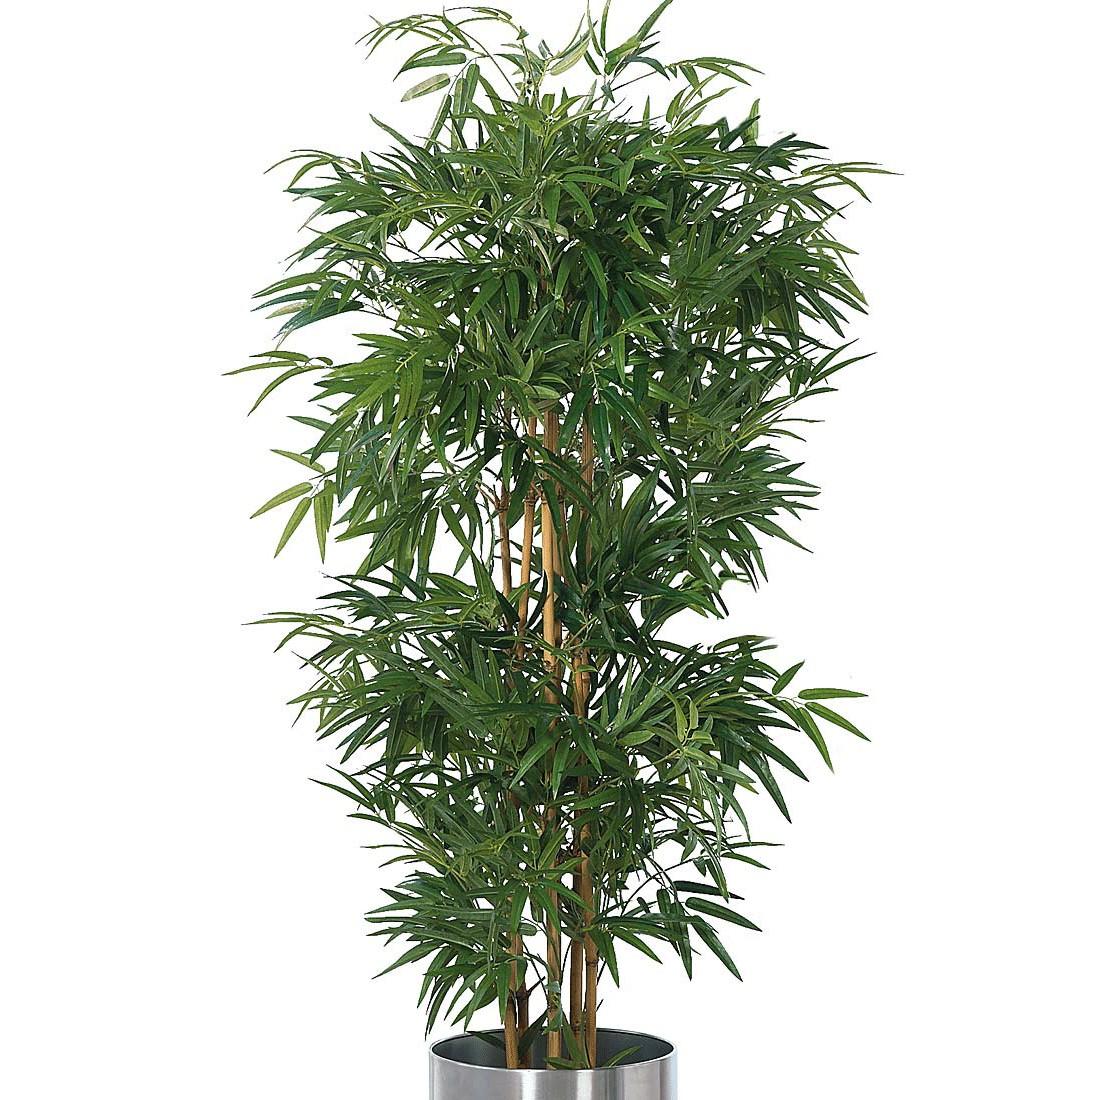 home24 Kunstpflanze Bambusbaum   Dekoration > Dekopflanzen > Kunstpflanzen   Textil   twentyfour